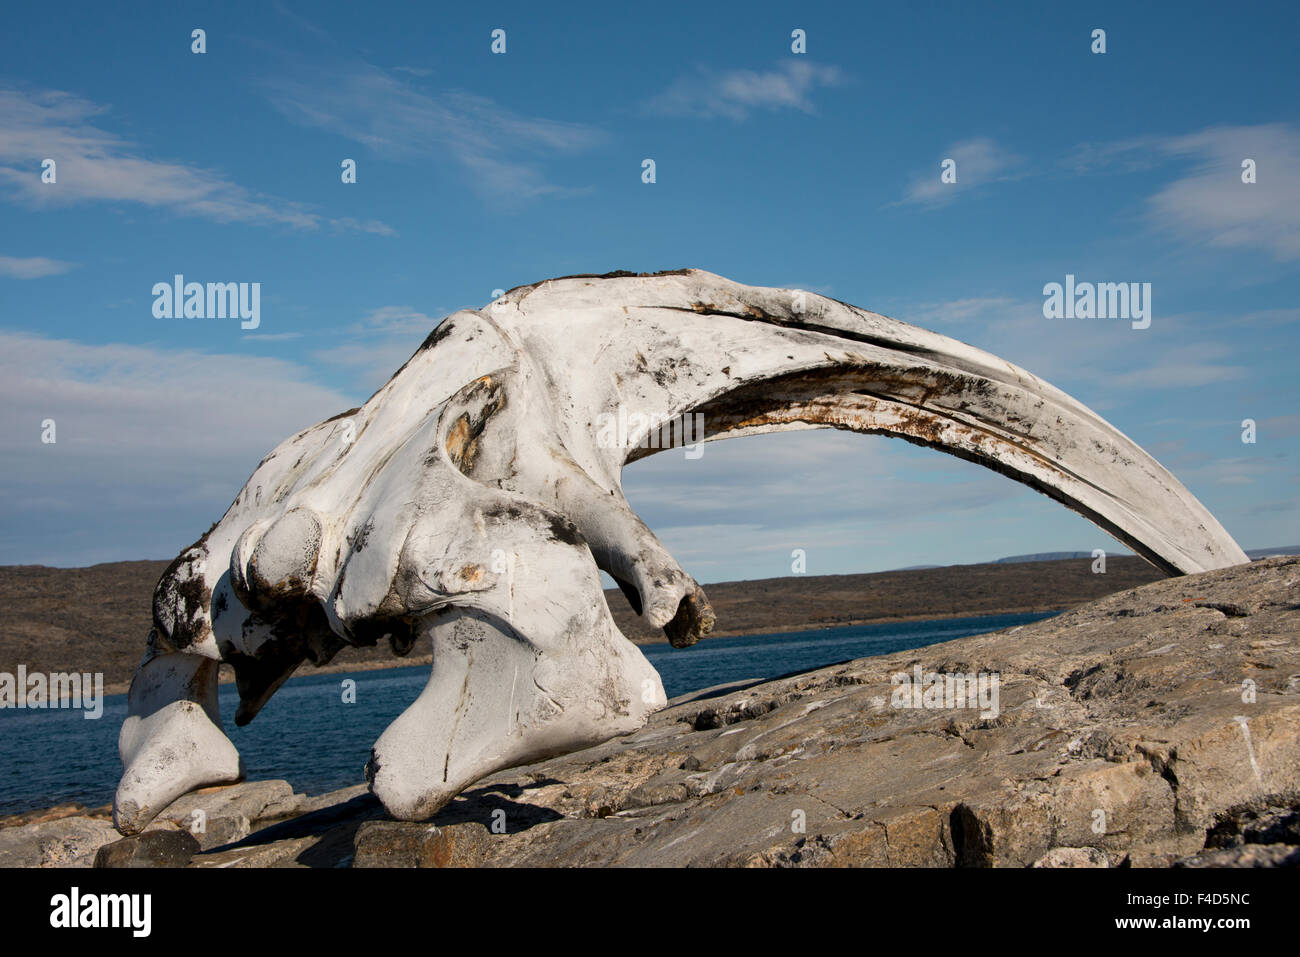 Canada, Nunavut, Qikiqtaaluk Region, Kekerten Island. Kekerten Historic Park preserving artifacts from whalers. - Stock Image